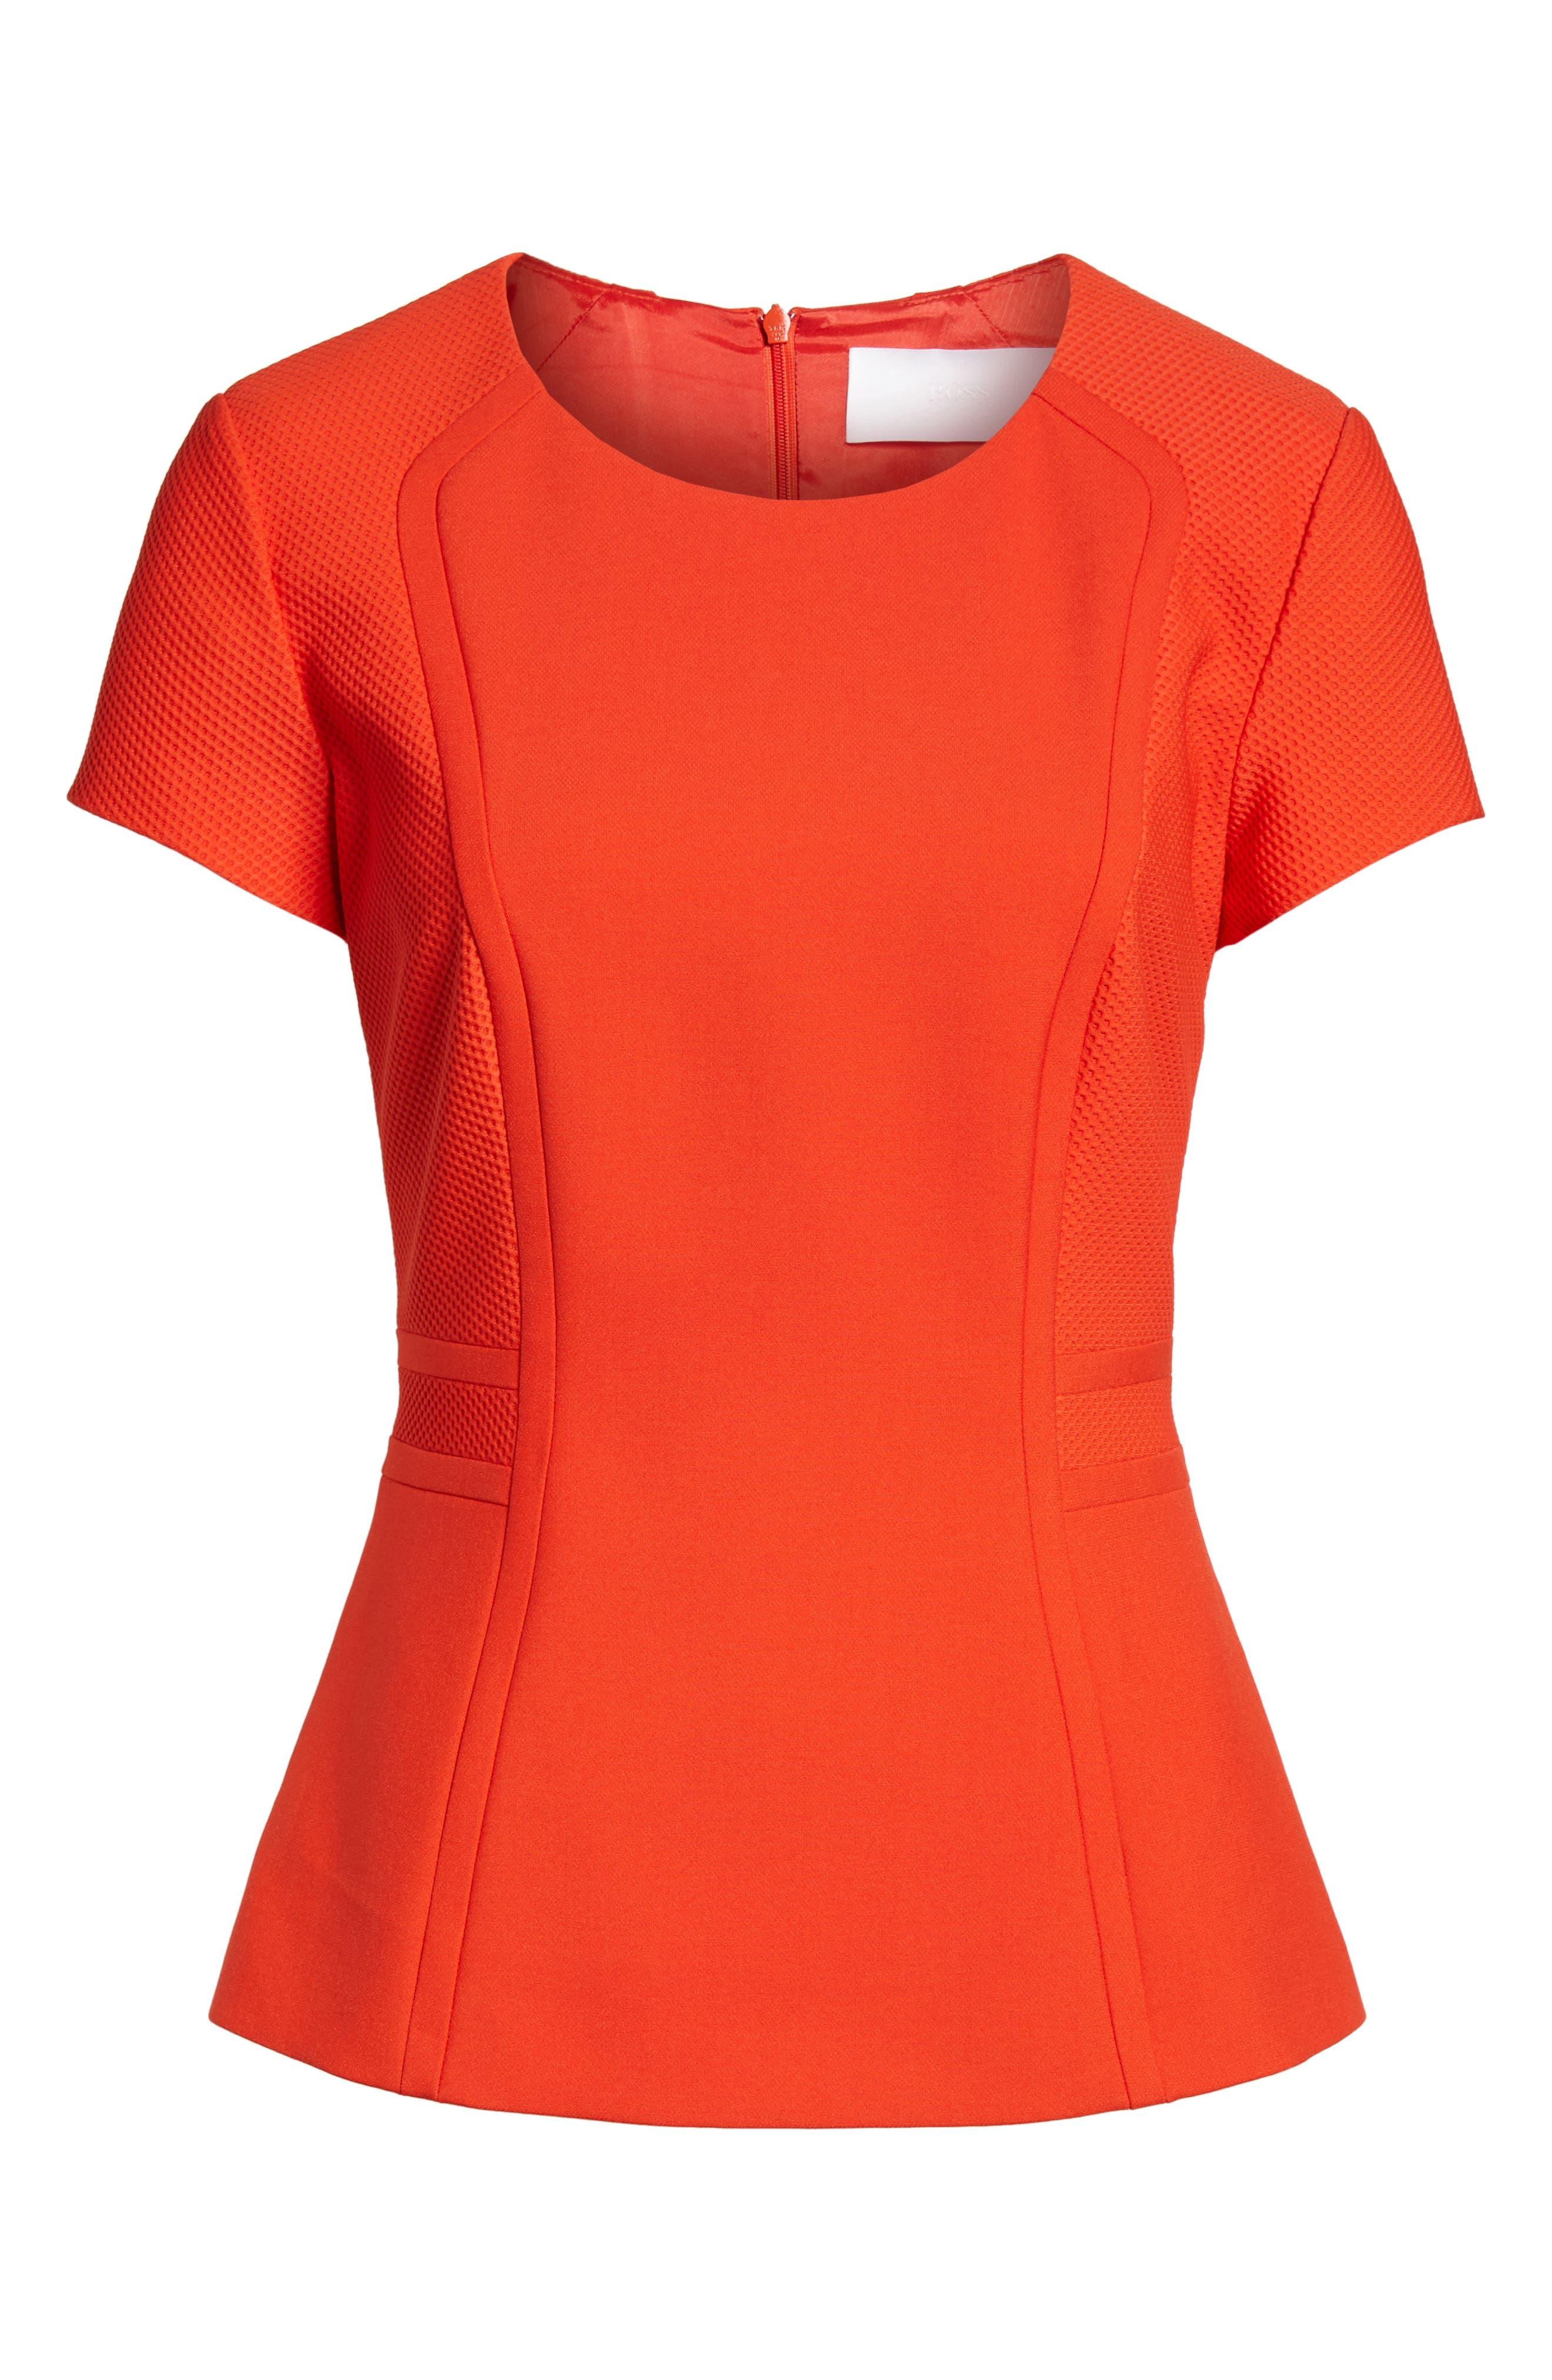 Idama Ponte Top,                             Alternate thumbnail 6, color,                             Sunset Orange